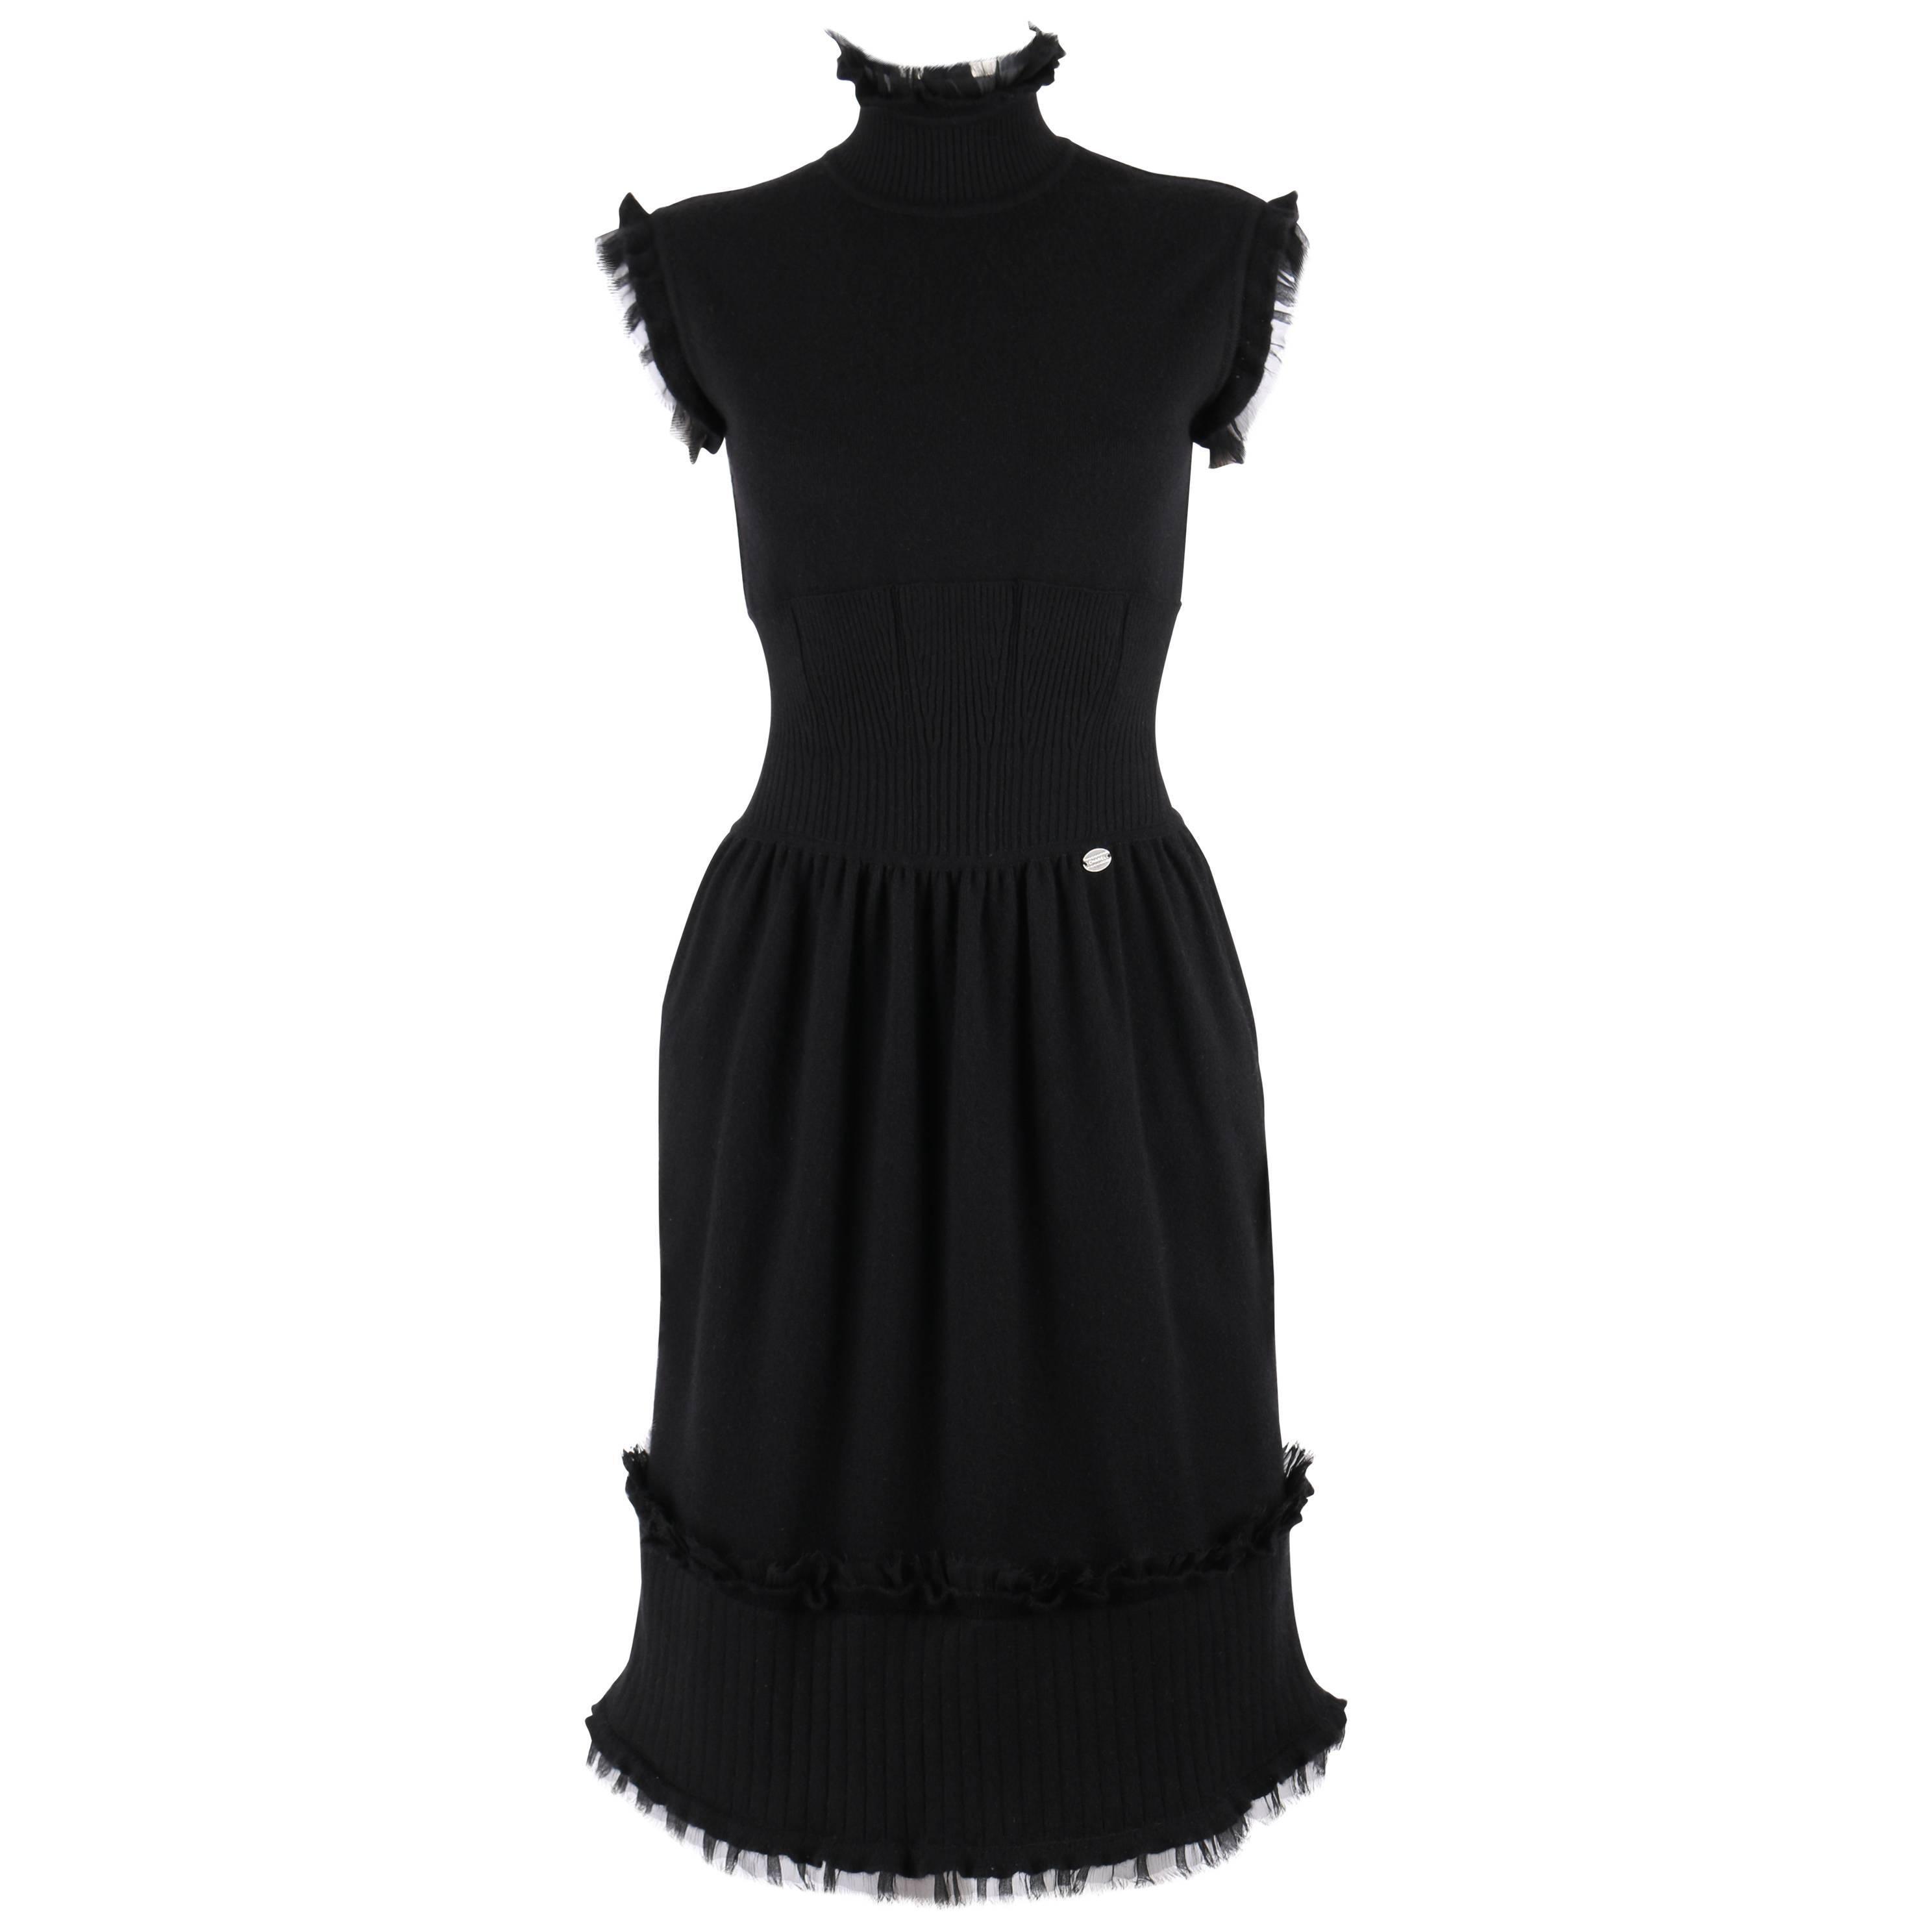 CHANEL Pre Fall 2008 Black Cashmere Knit Mock Neck Dress Silk Raw Edge Trim 34